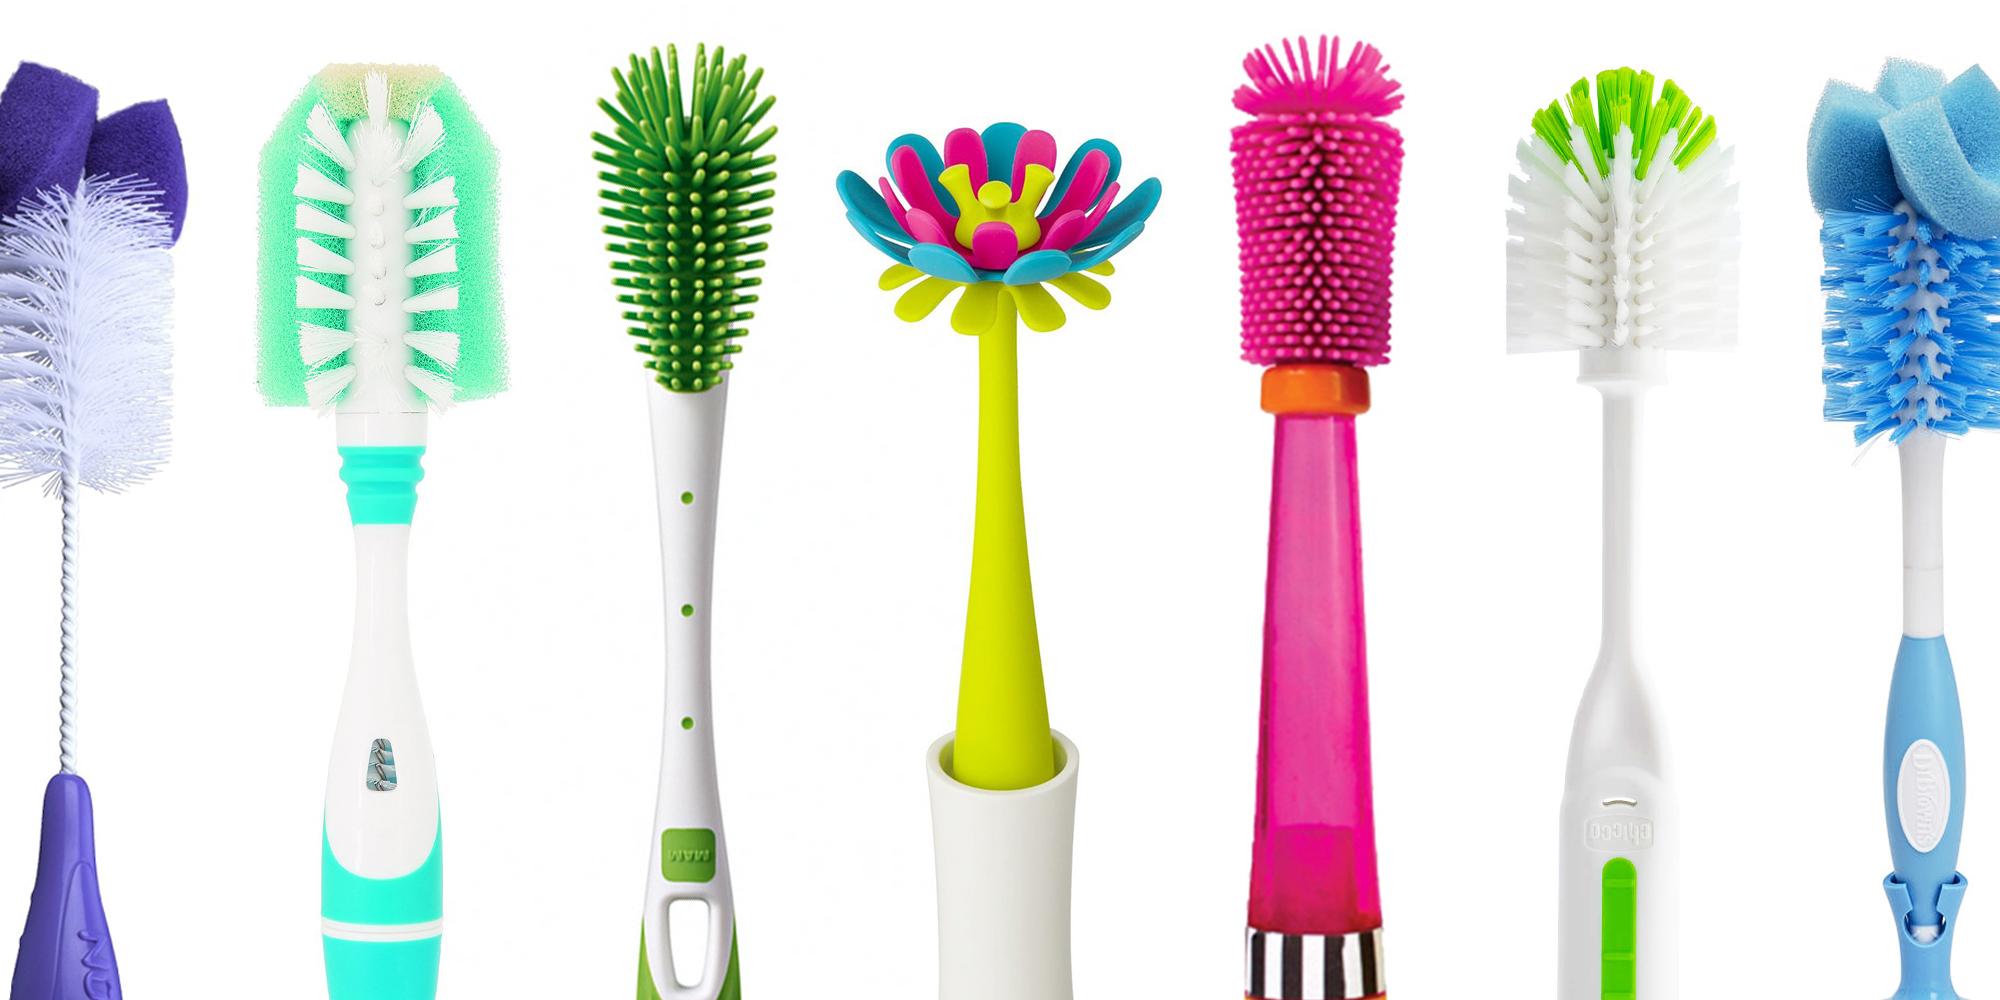 15 Best Bottle Brushes of 2018 - Baby Bottle Brushes and ...